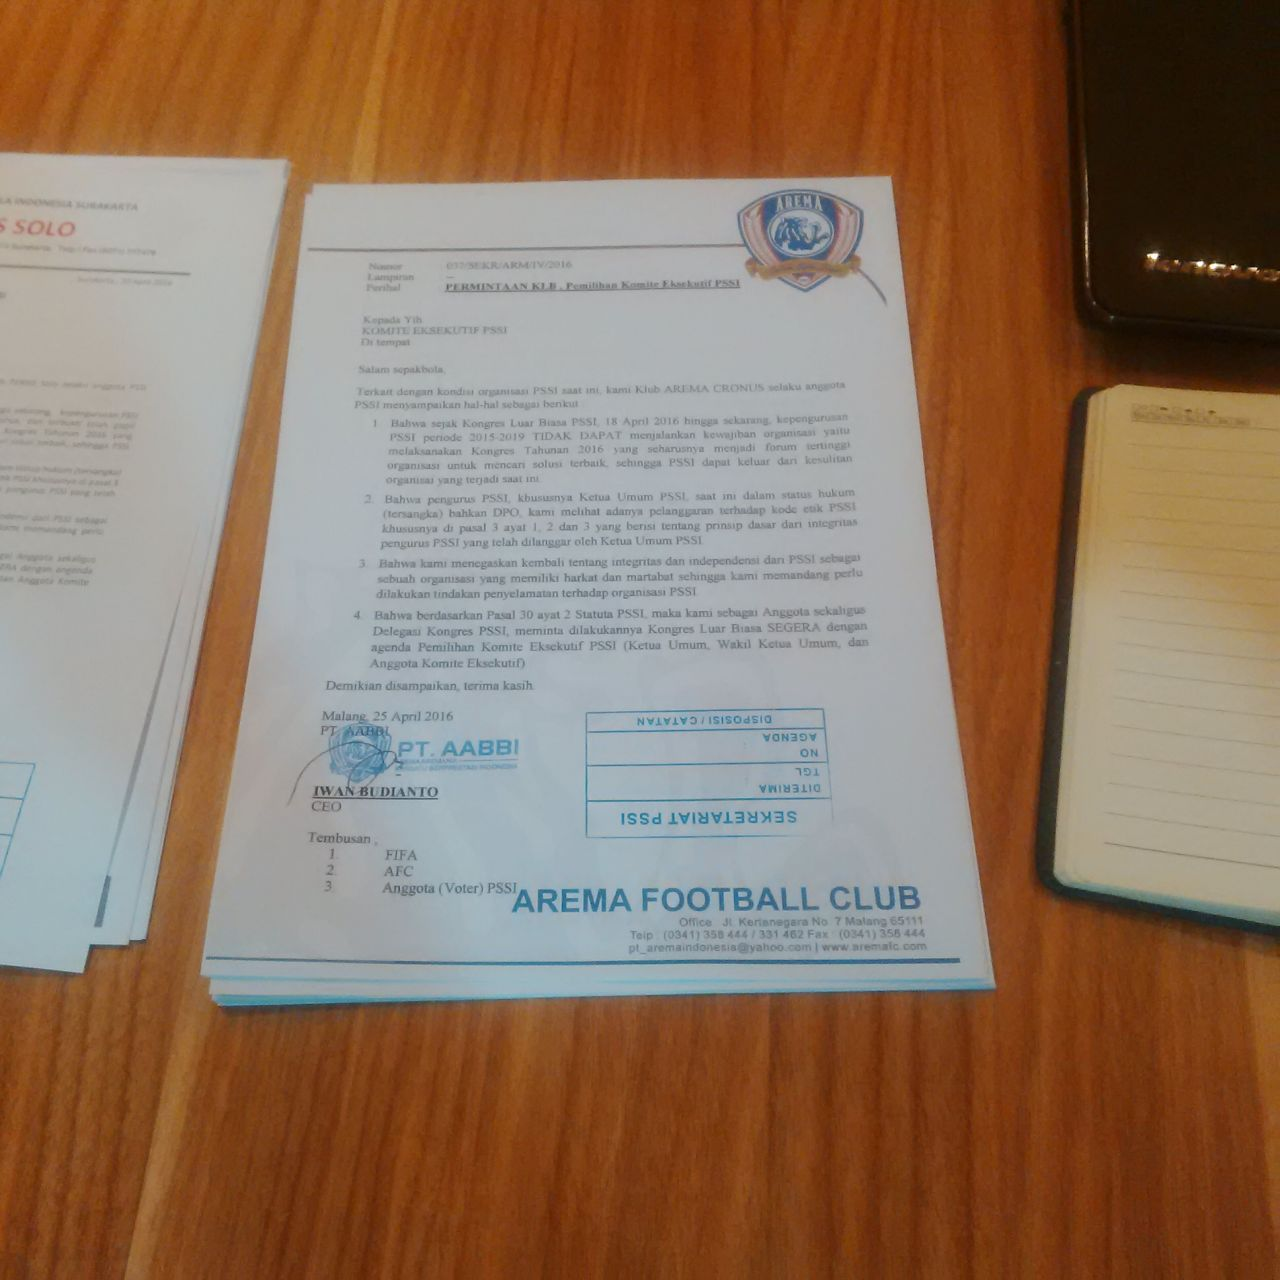 Salinan surat permintaan KLB untuk mengganti La Nyalla yang diteken CEO Arema Football Club Iwan Budianto. Foto: Mahmud Alexander/Rappler